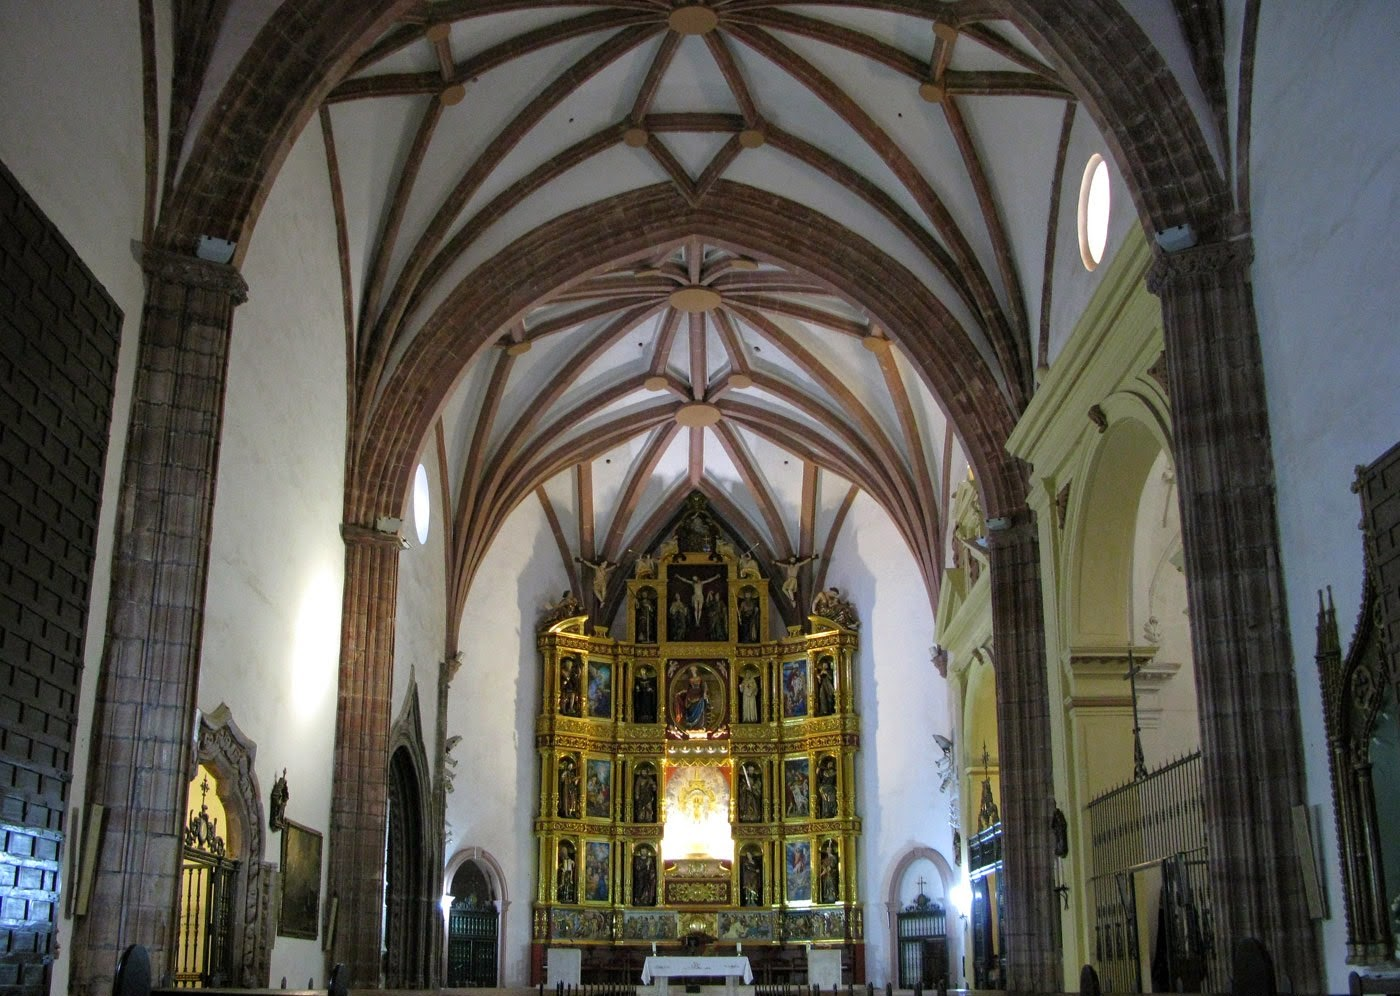 Atelier du patrimoine et d 39 architecture iglesia santa - Parroquia santa catalina la solana ...